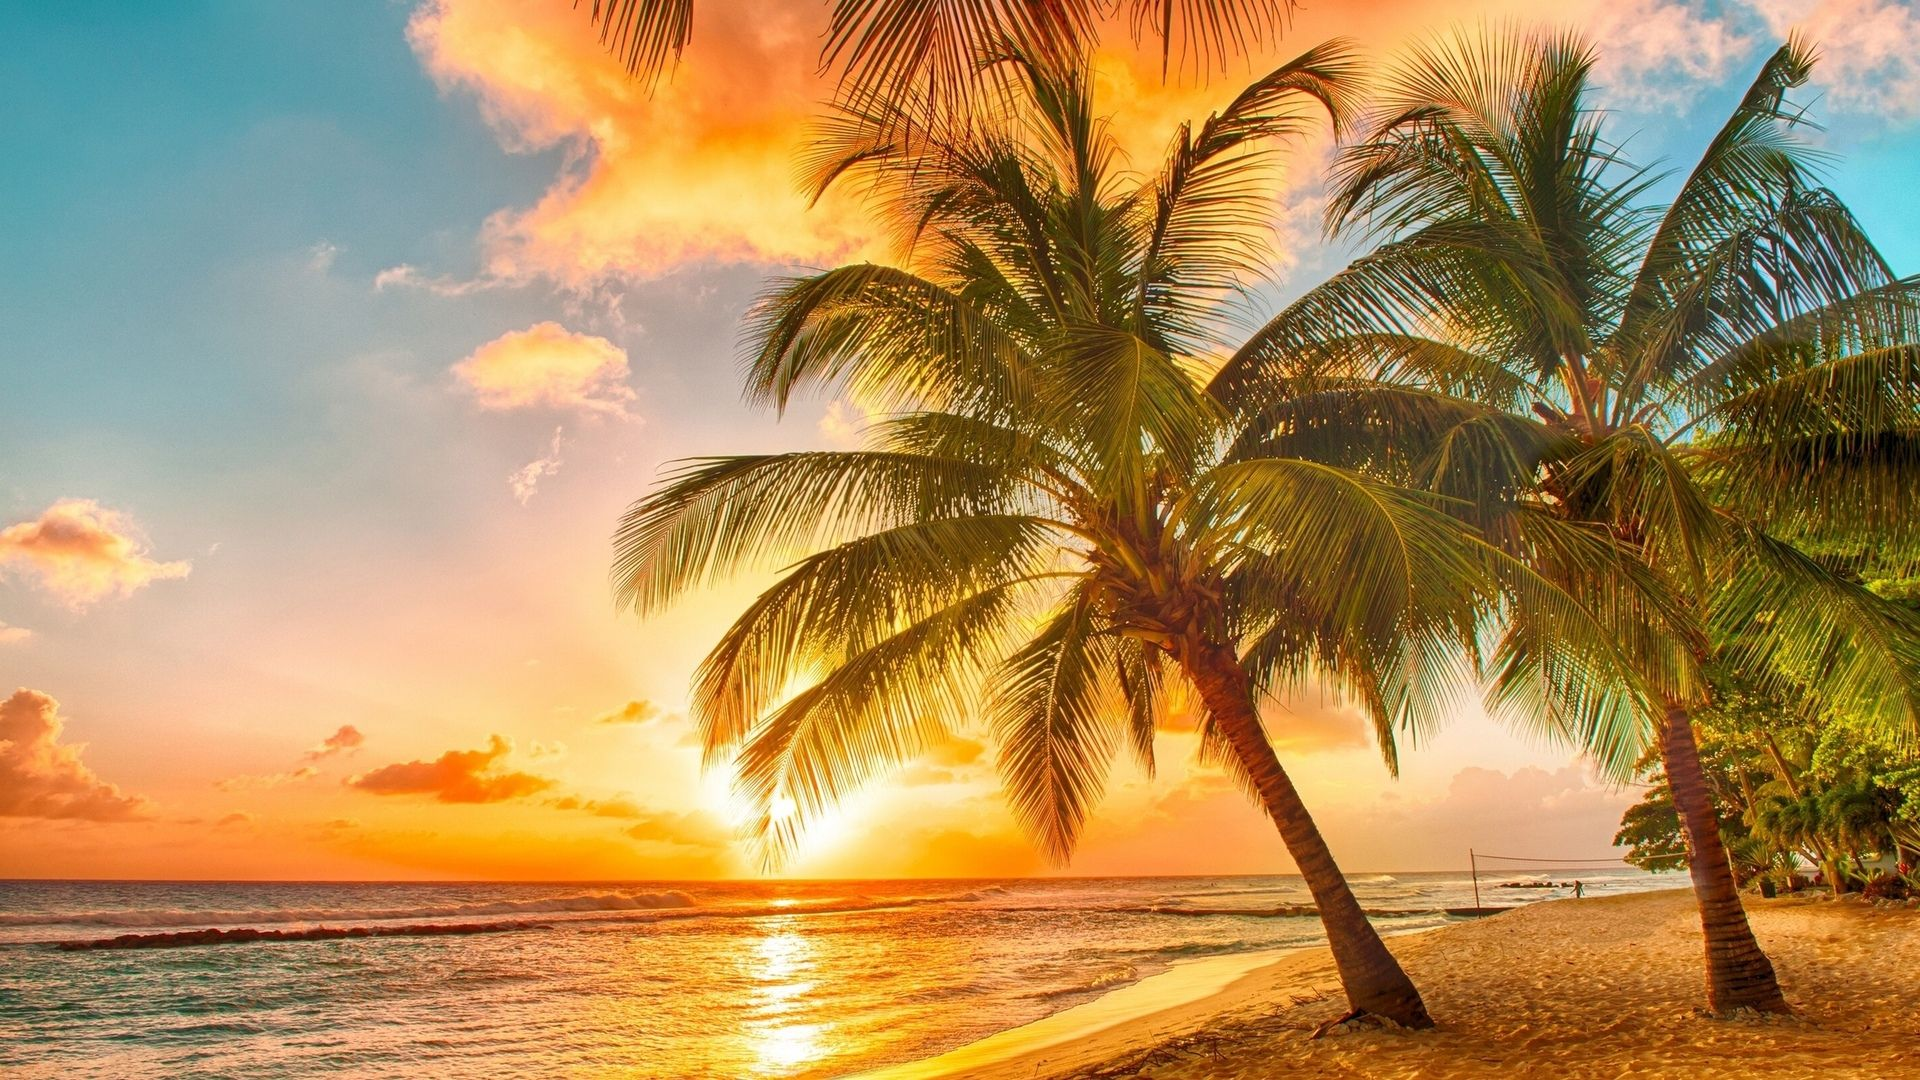 Aloha download wallpaper image